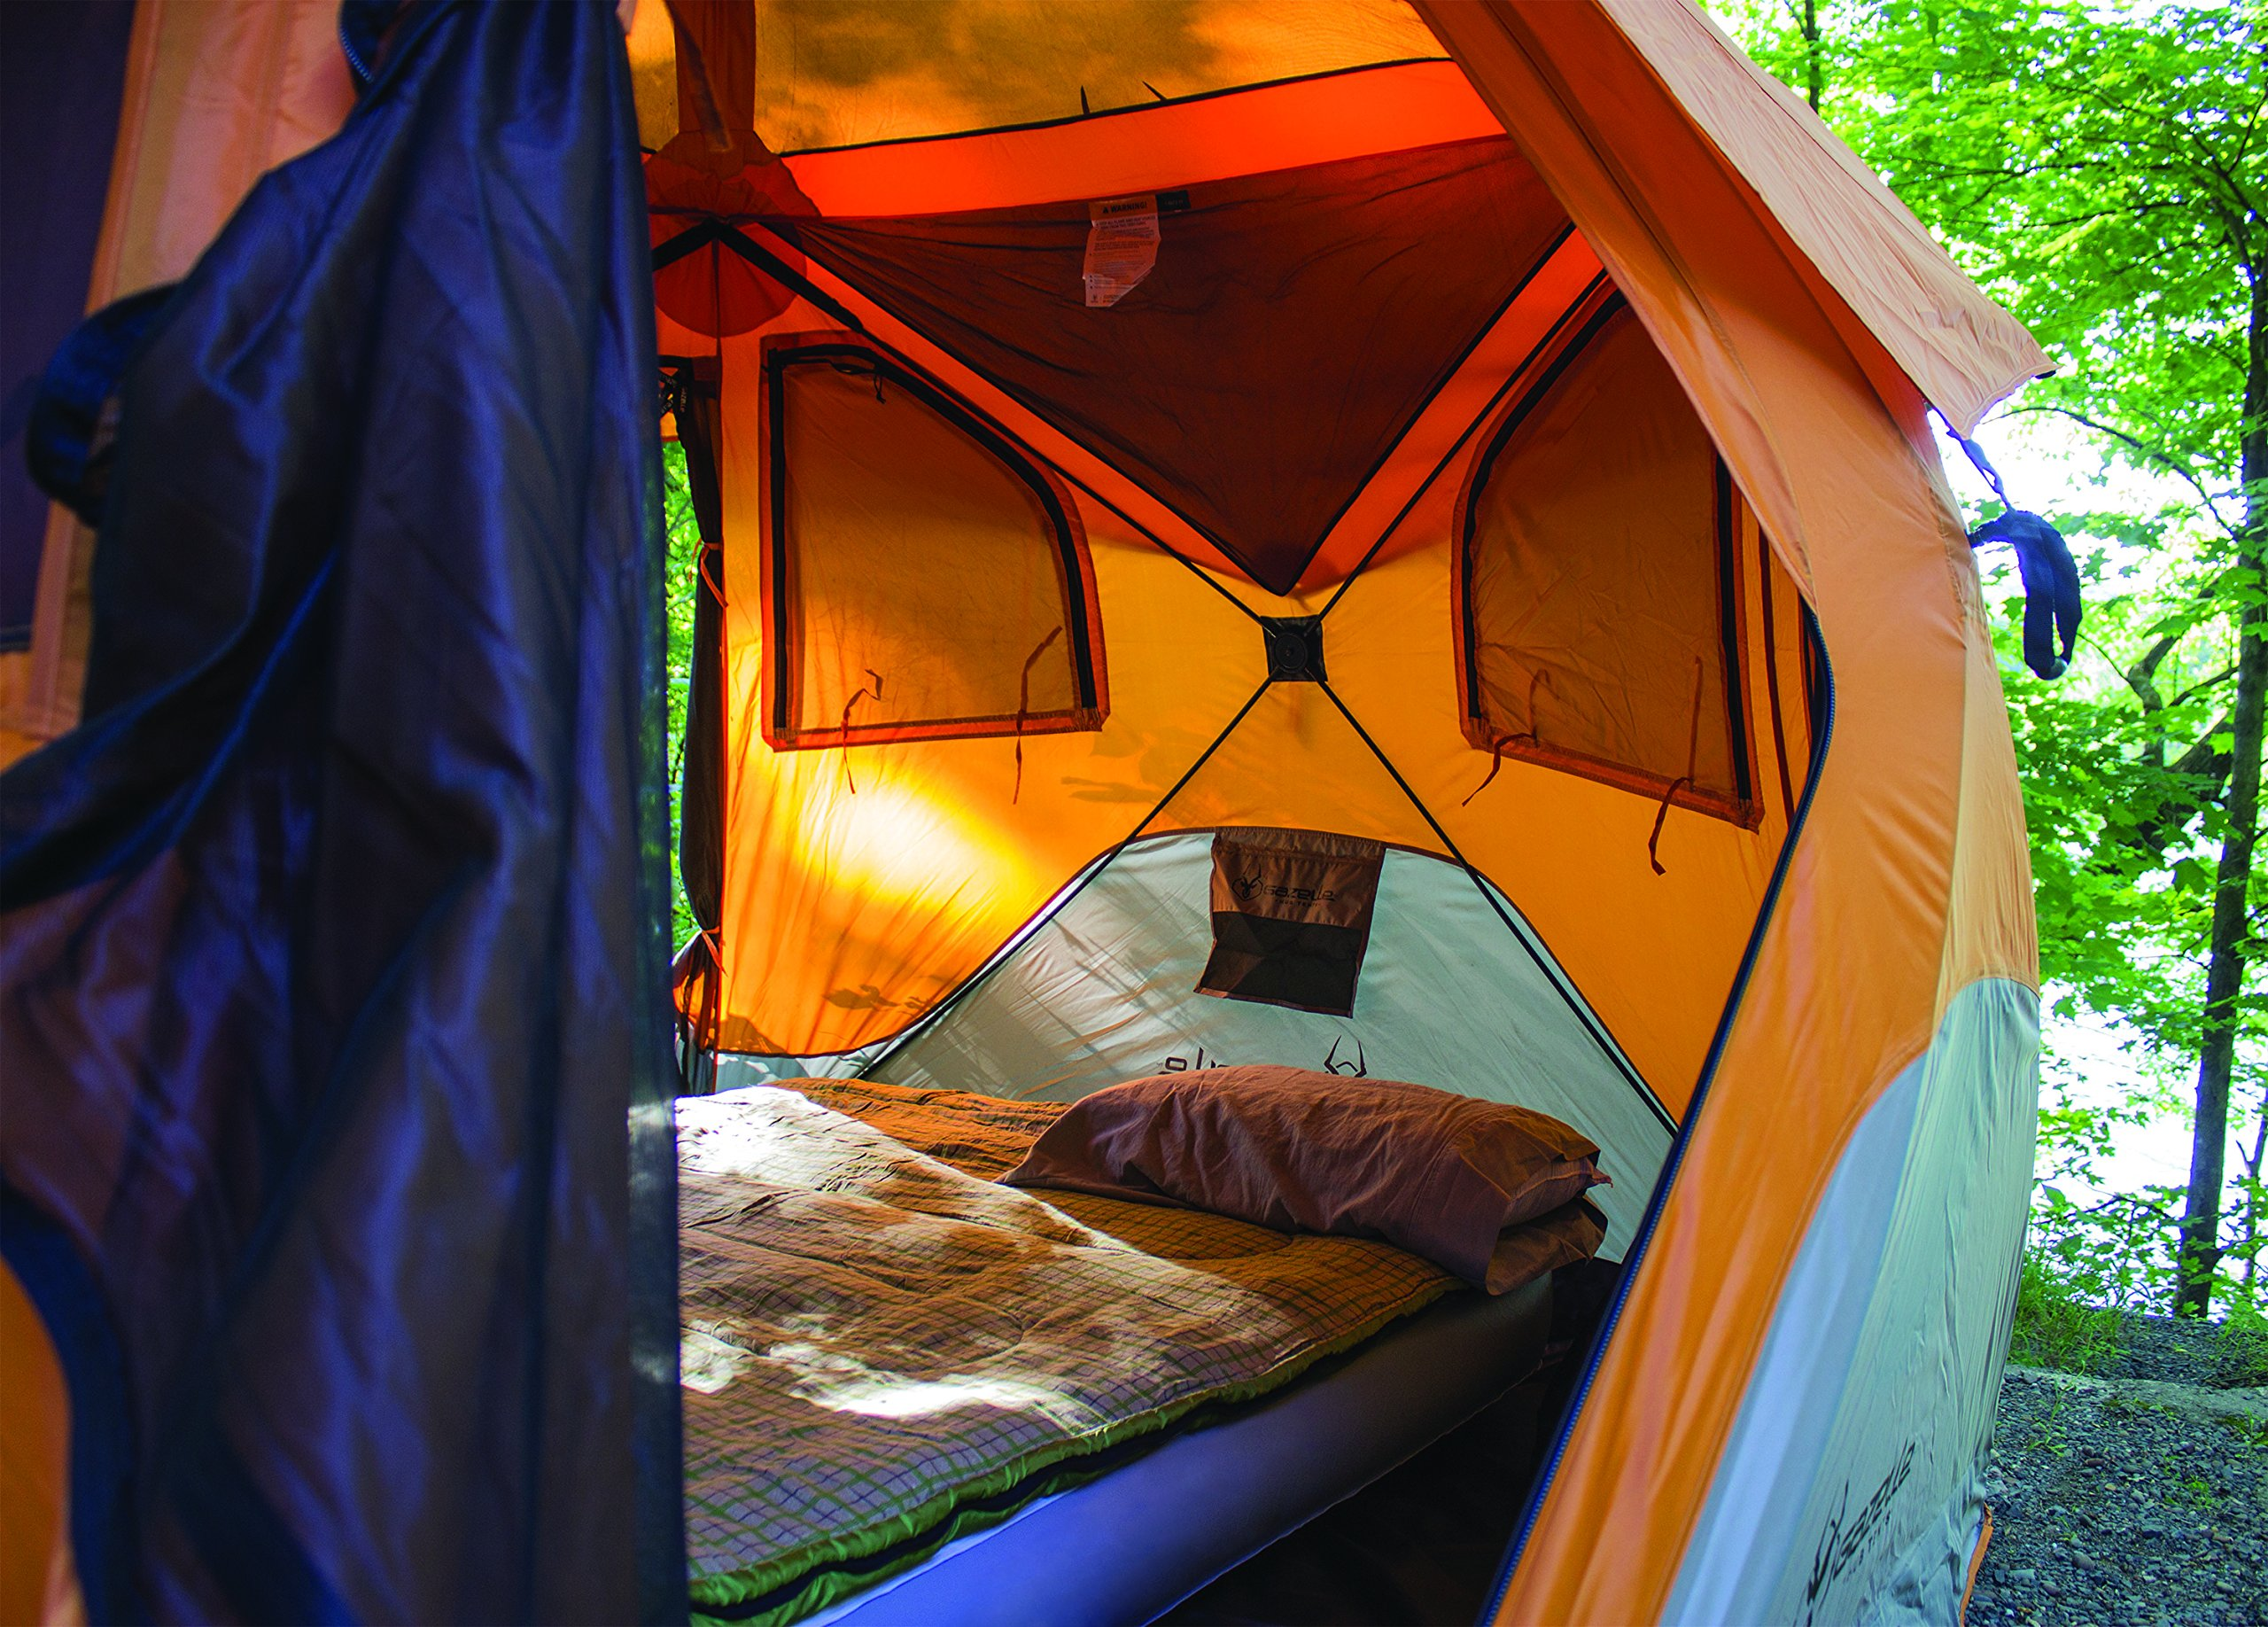 Gazelle 22272 T4 Pop-Up Portable Camping Hub Tent, Orange ...